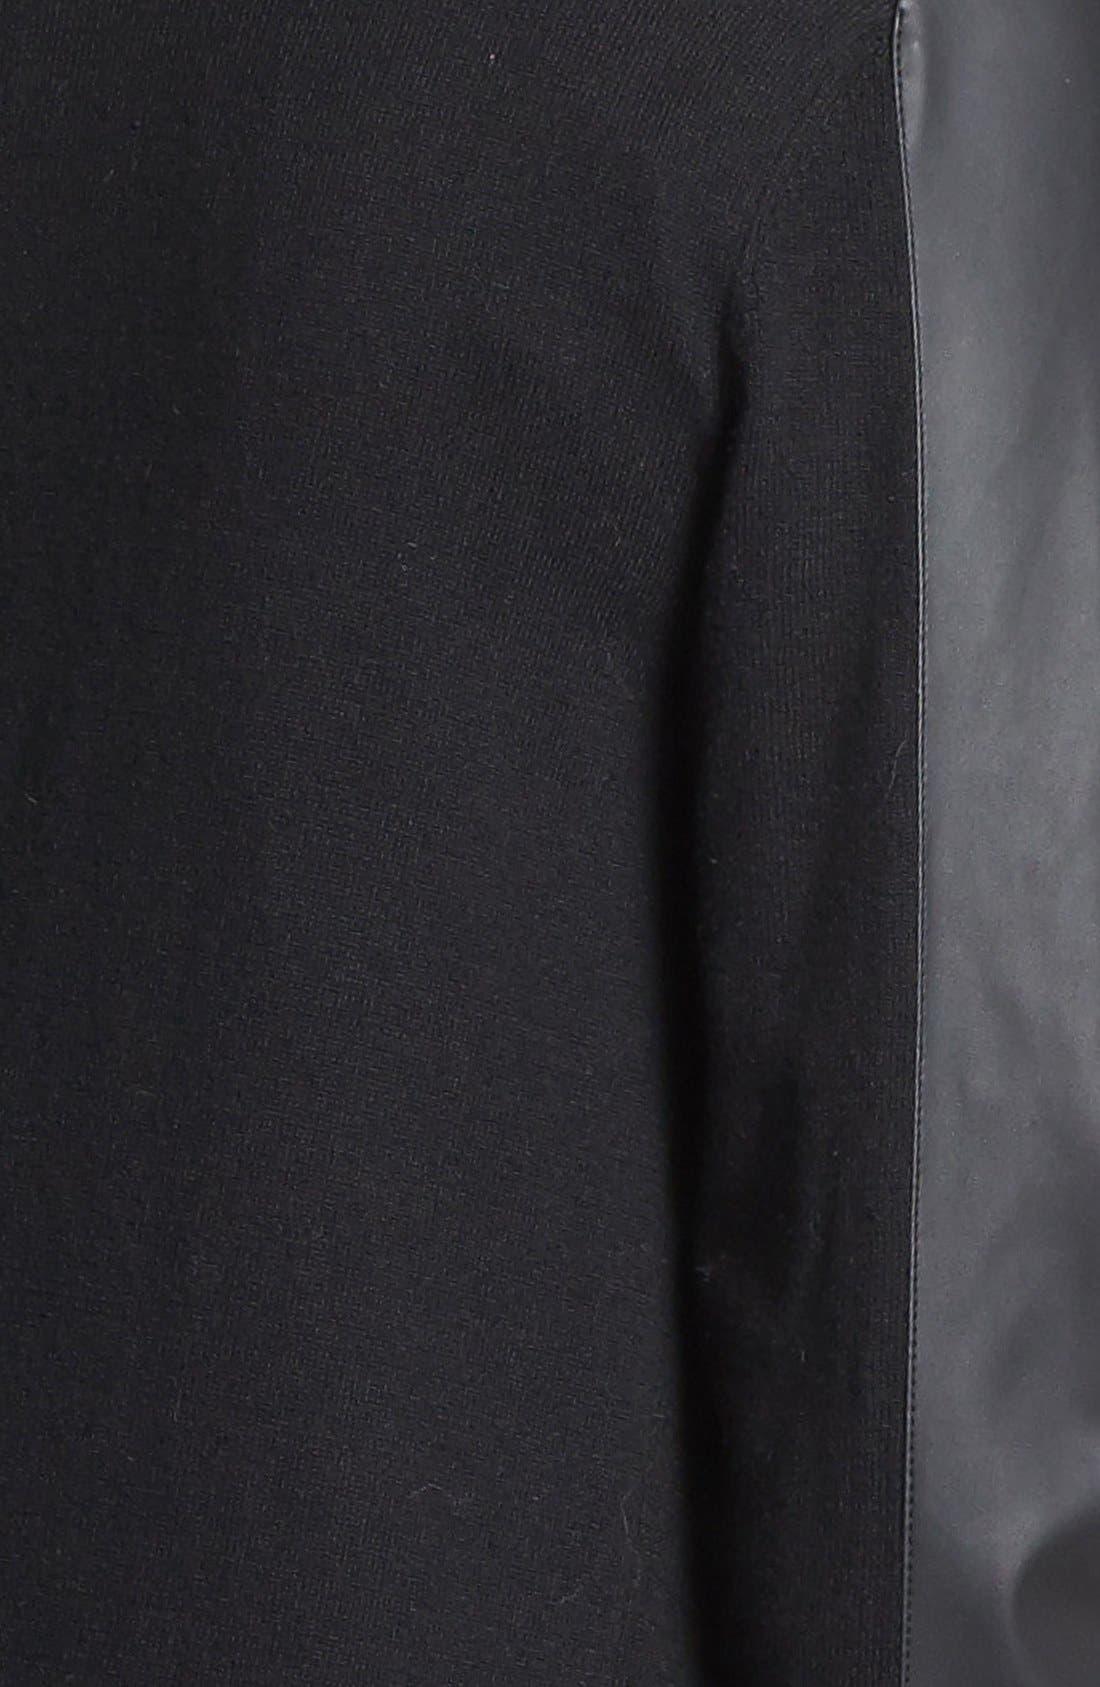 Alternate Image 3  - MICHAEL Michael Kors Faux Leather Sleeve V-Neck Cardigan (Petite)